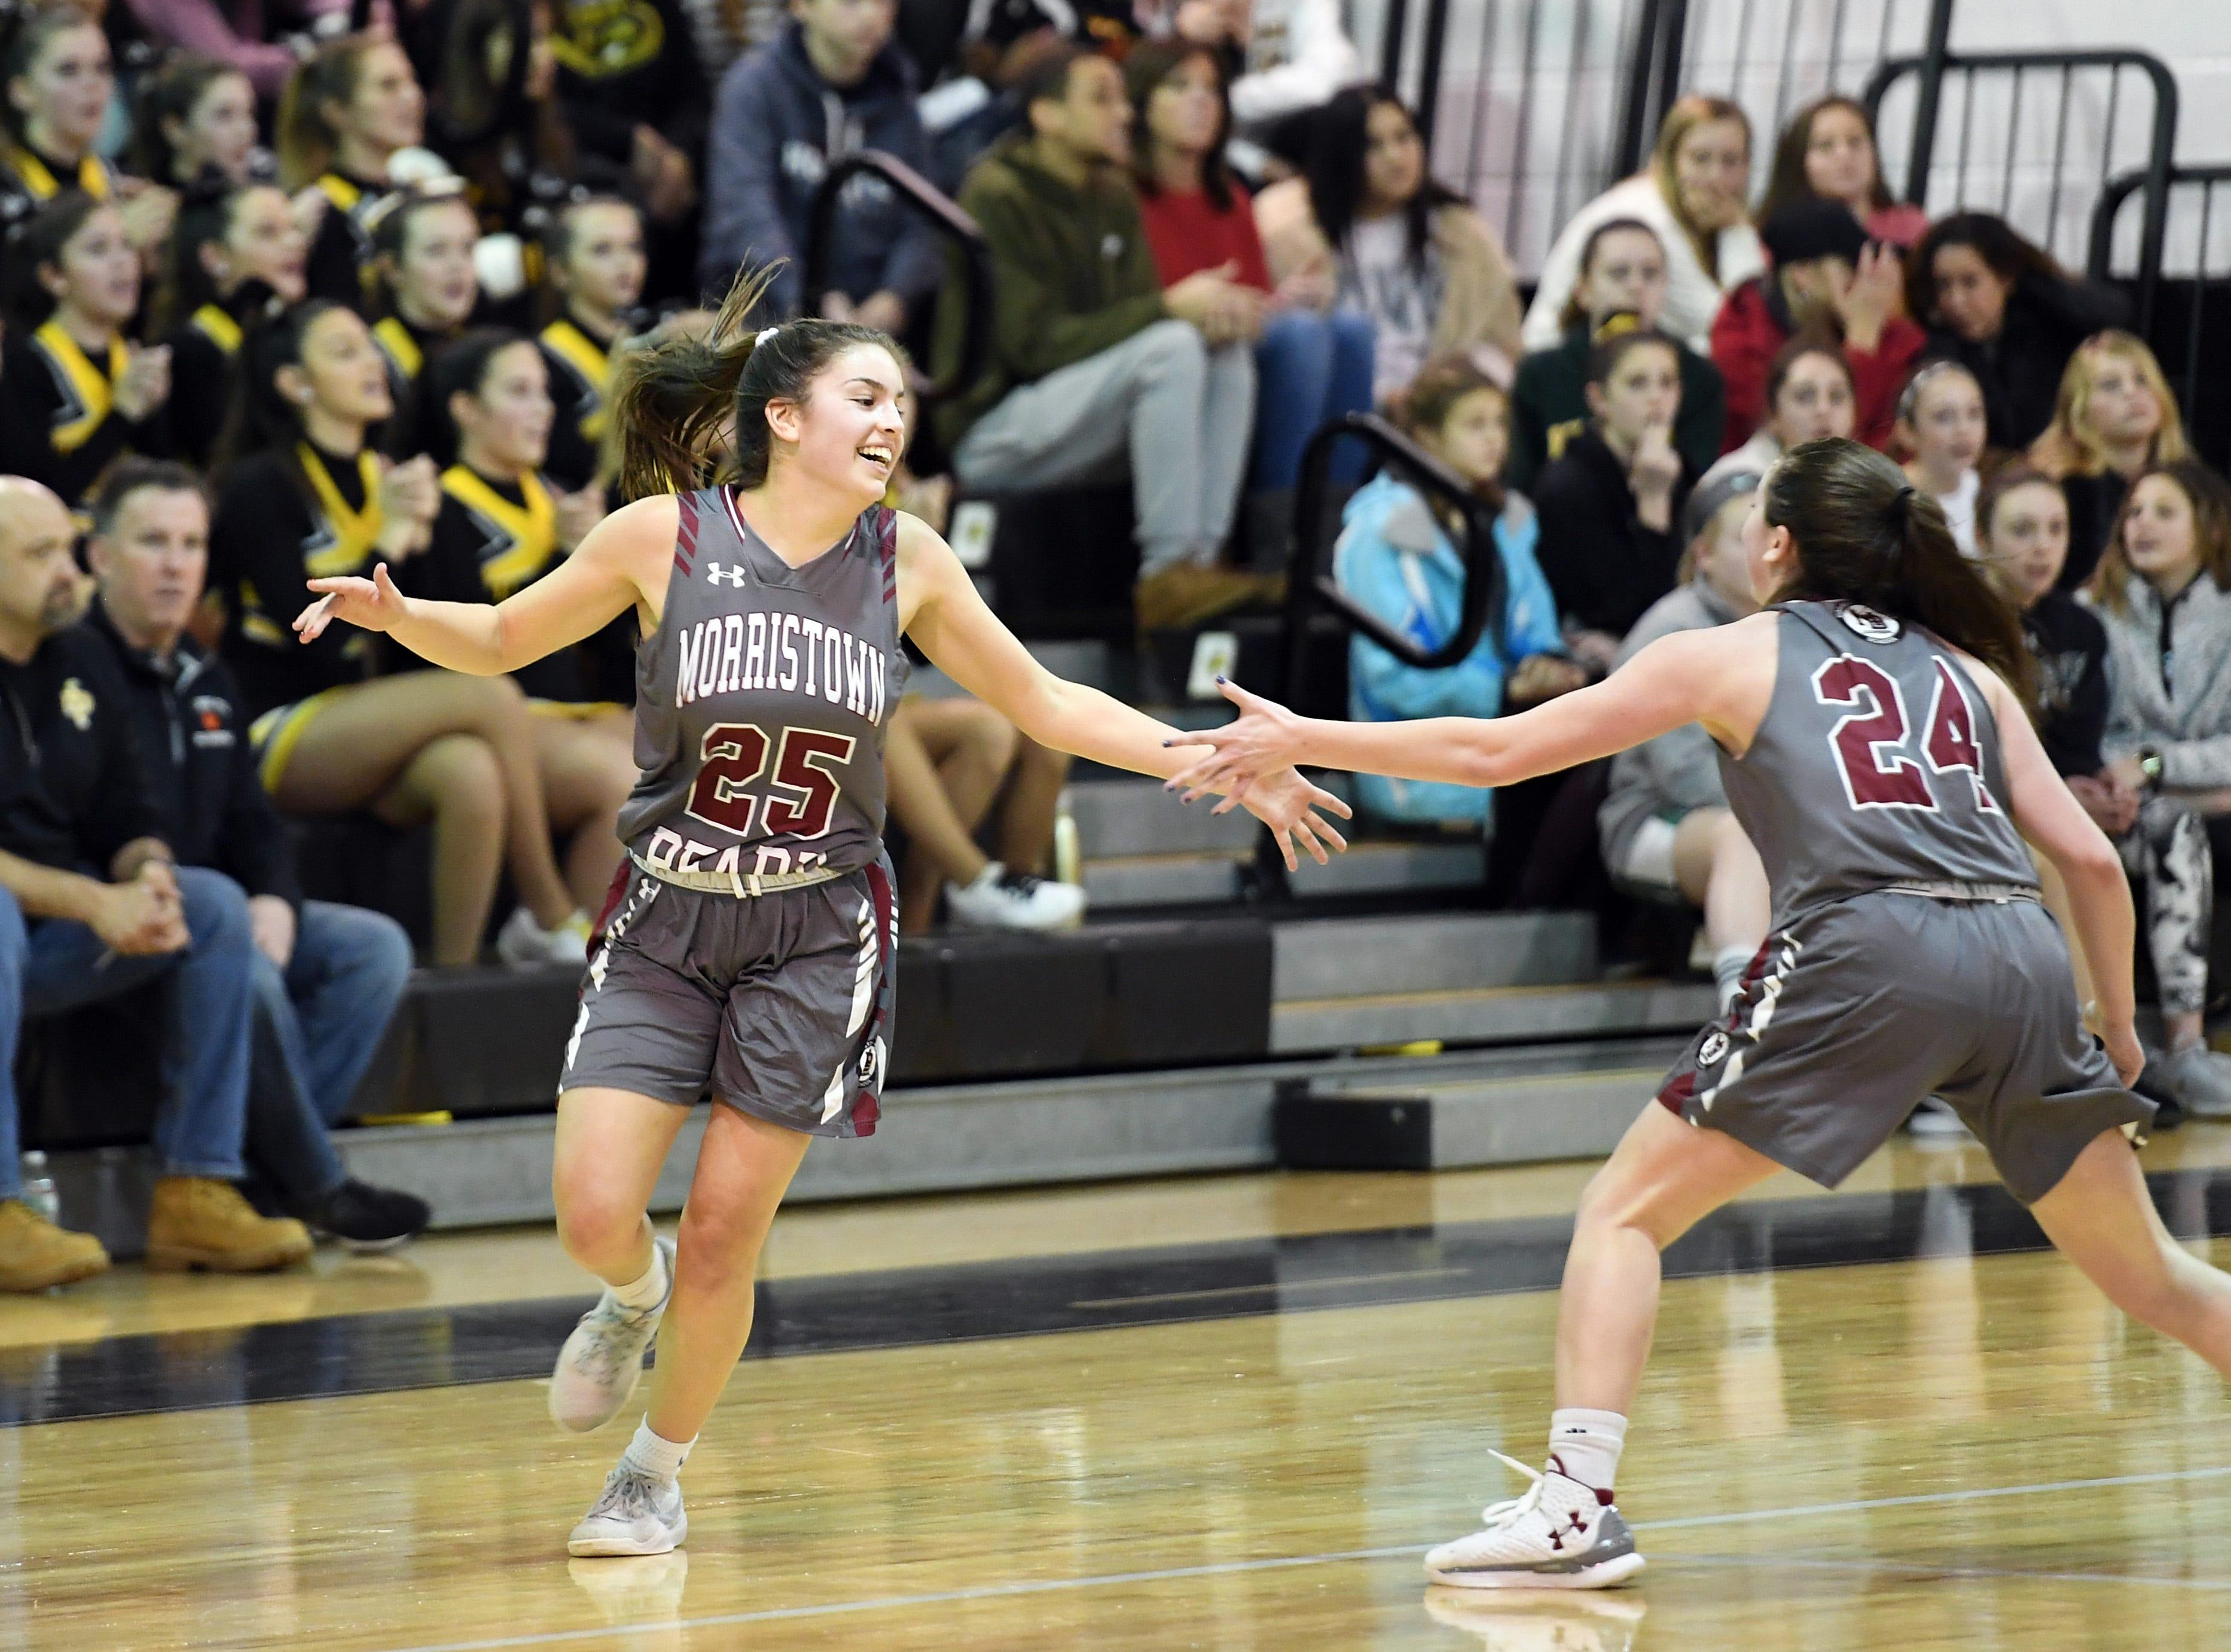 Morristown-Beard girls basketball at Hanover Park on Friday, January 4, 2019. MB #25 Christina De Mattheis celebrates after scoring in the second quarter.